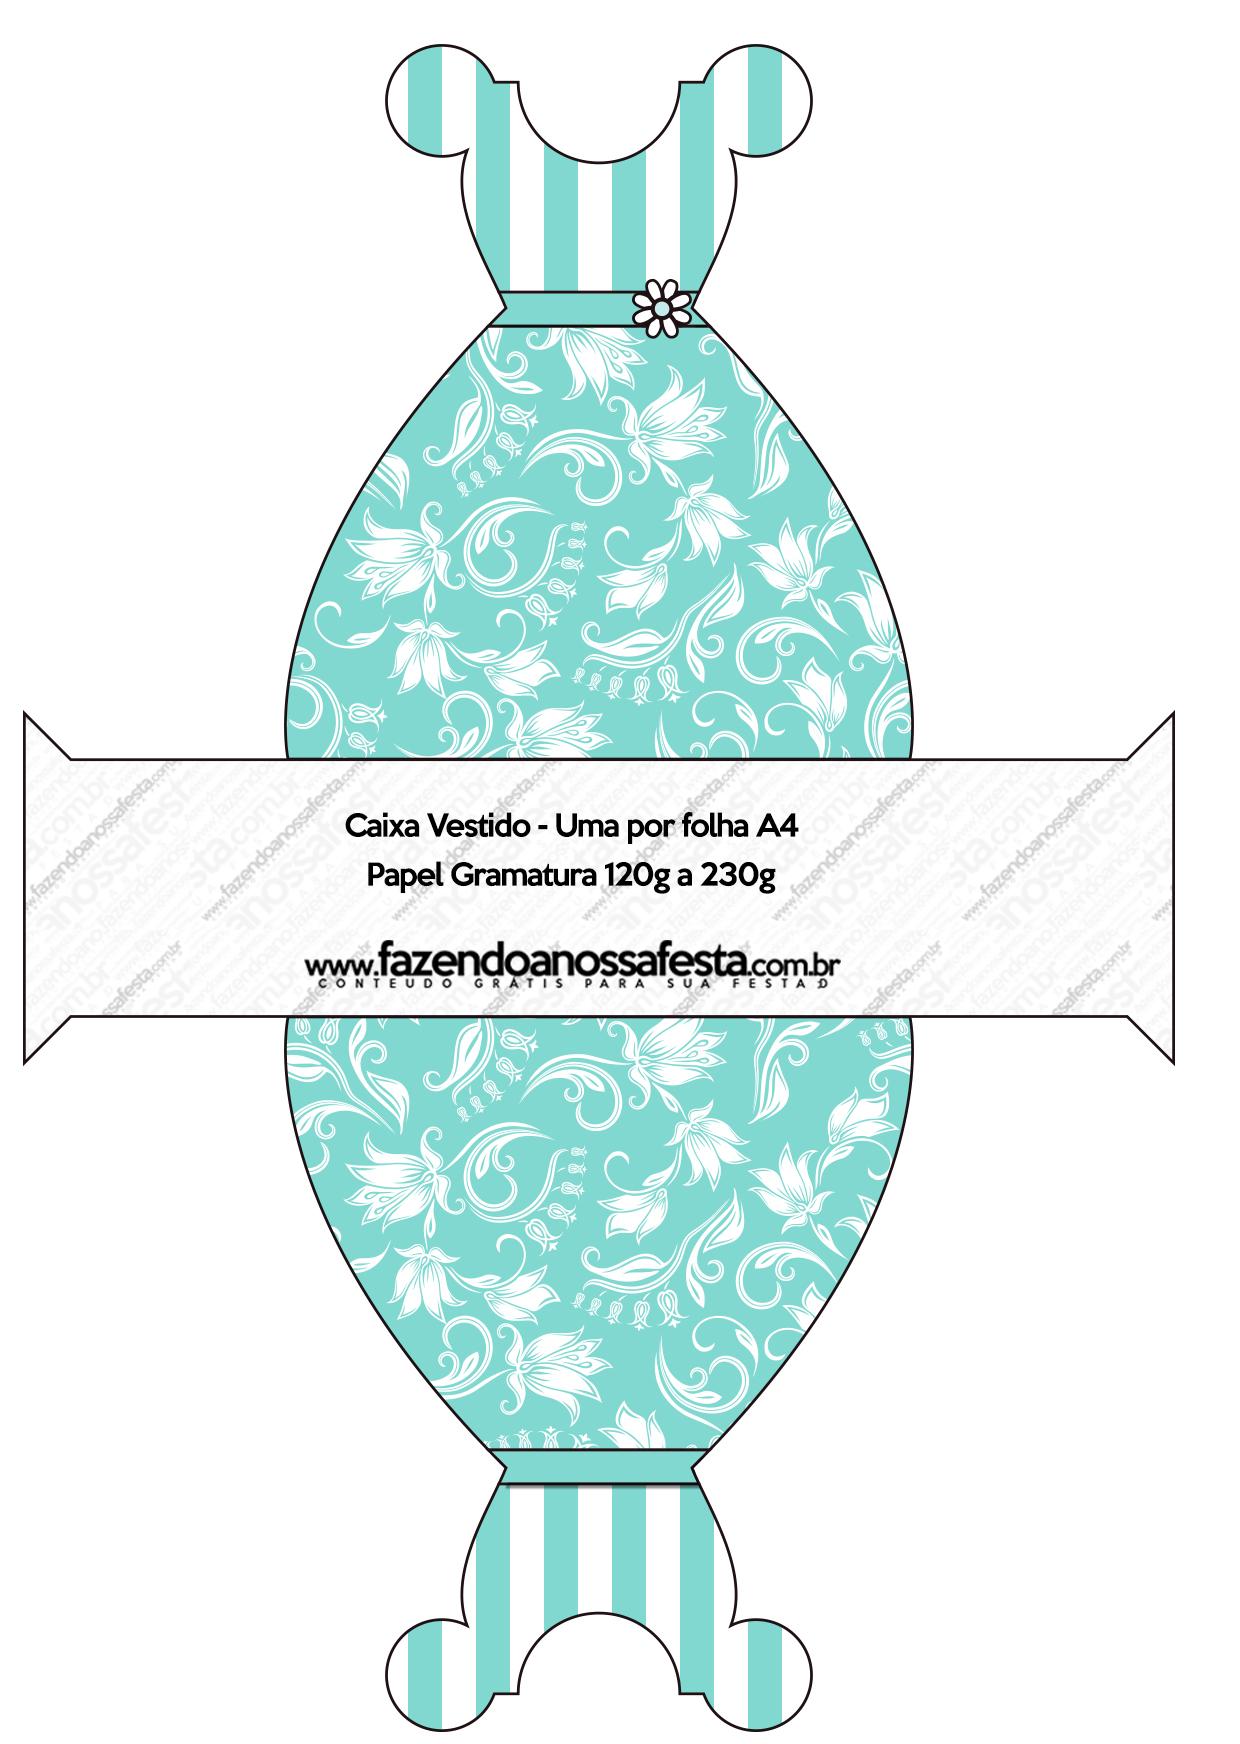 Kit Azul Tiffany Fazendo a Nossa Festa 27.jpg (1240×656) KOYTIA  #309B91 1240 1744